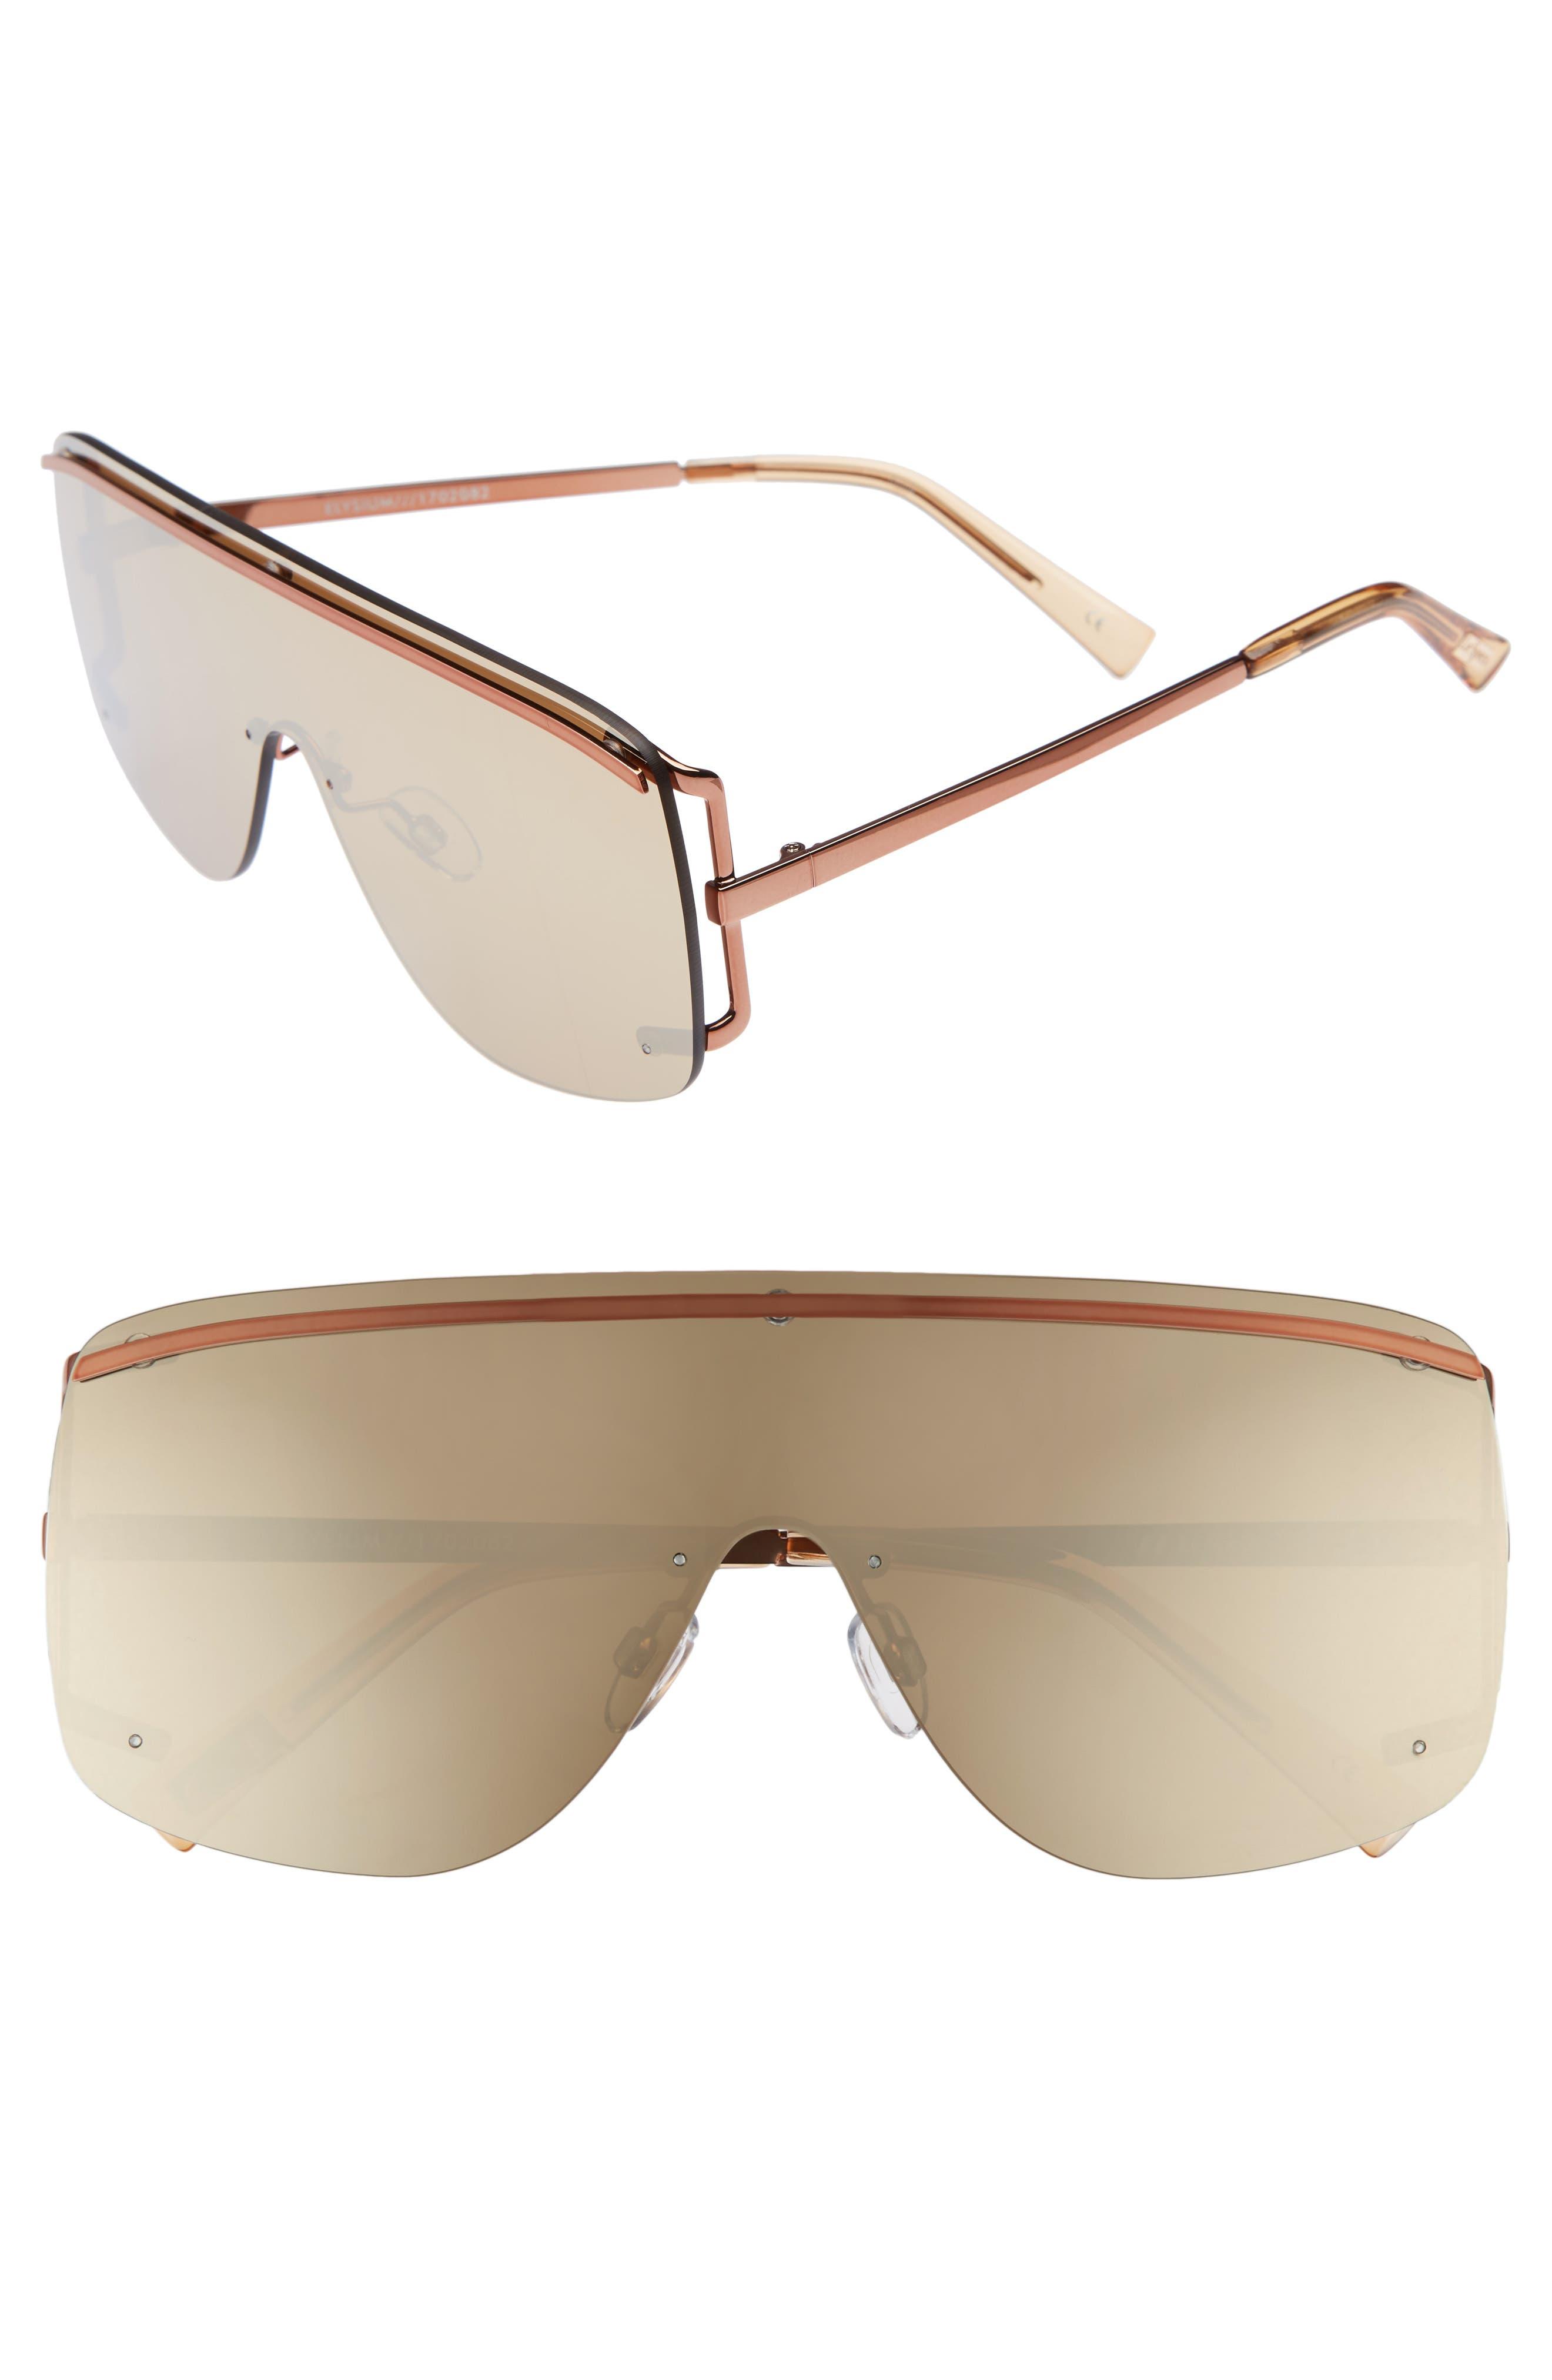 Elysium 140mm Shield Sunglasses,                             Main thumbnail 1, color,                             COPPER